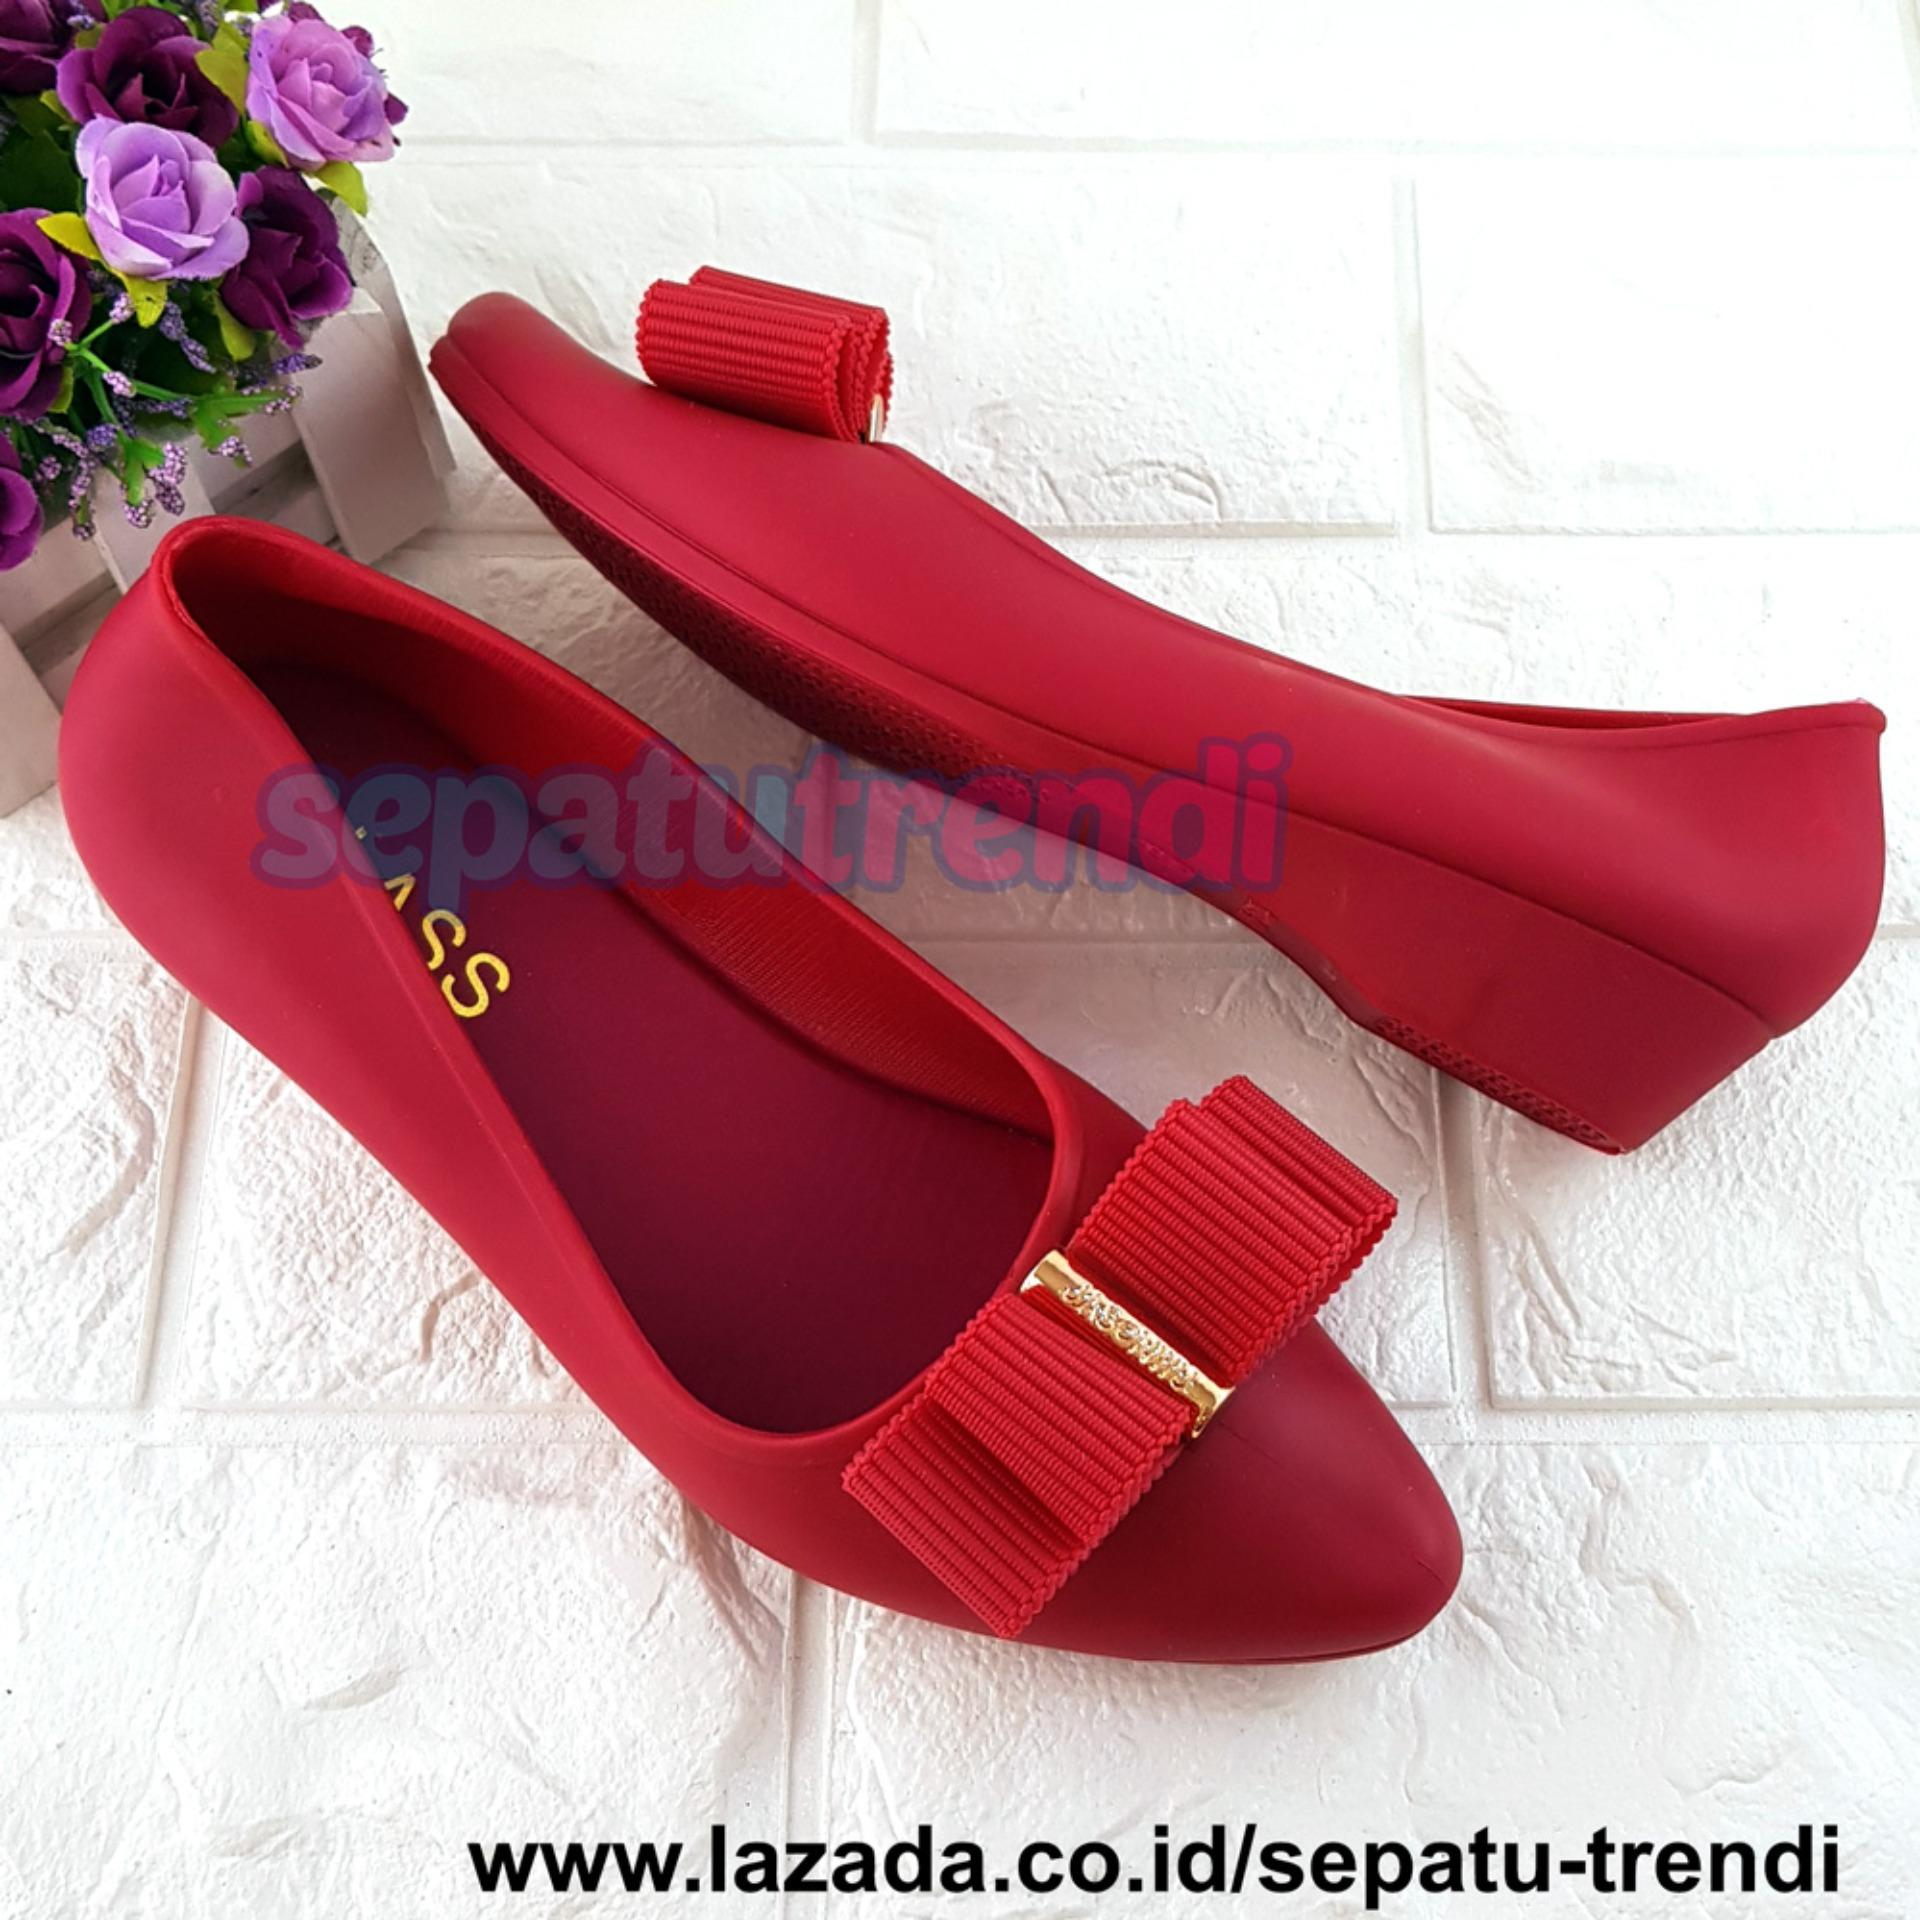 Sepatu Wanita Terbaru  527ca7117a